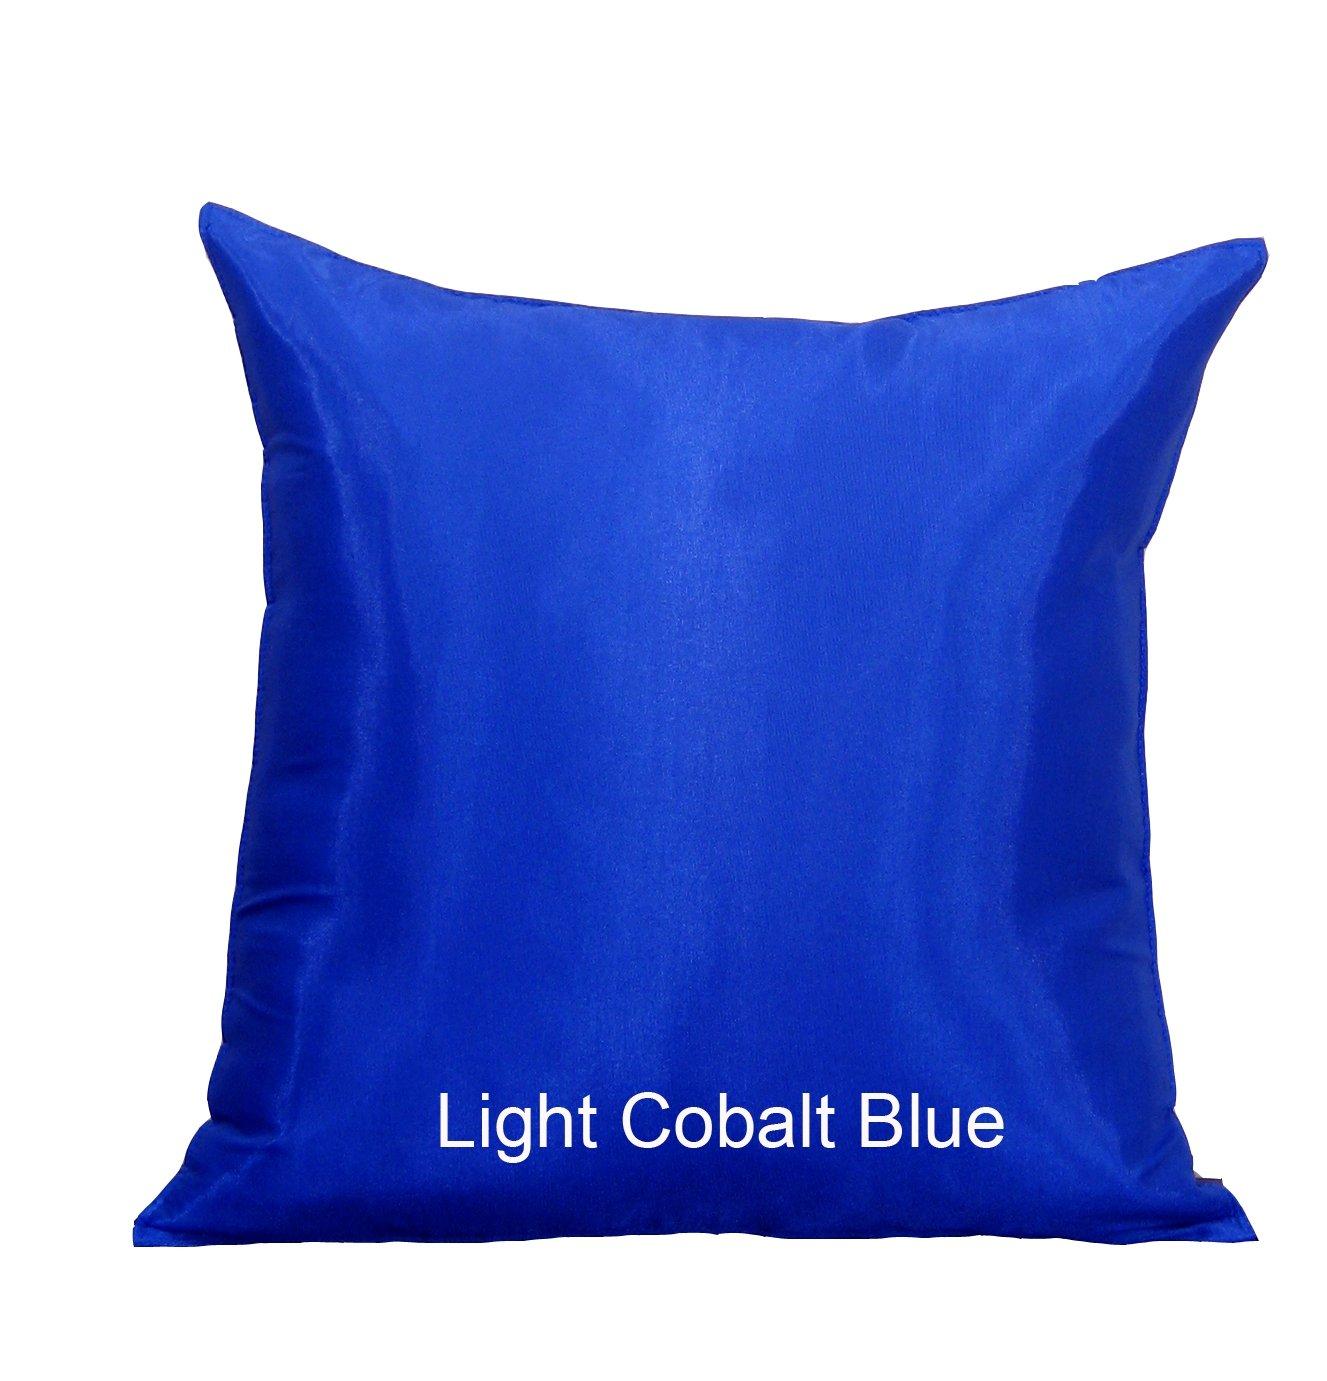 Shopping The Globe - 1 Thai Silk Look 16''x16'' Pillow Cover (Pillow Not Included) - Light Cobalt Blue